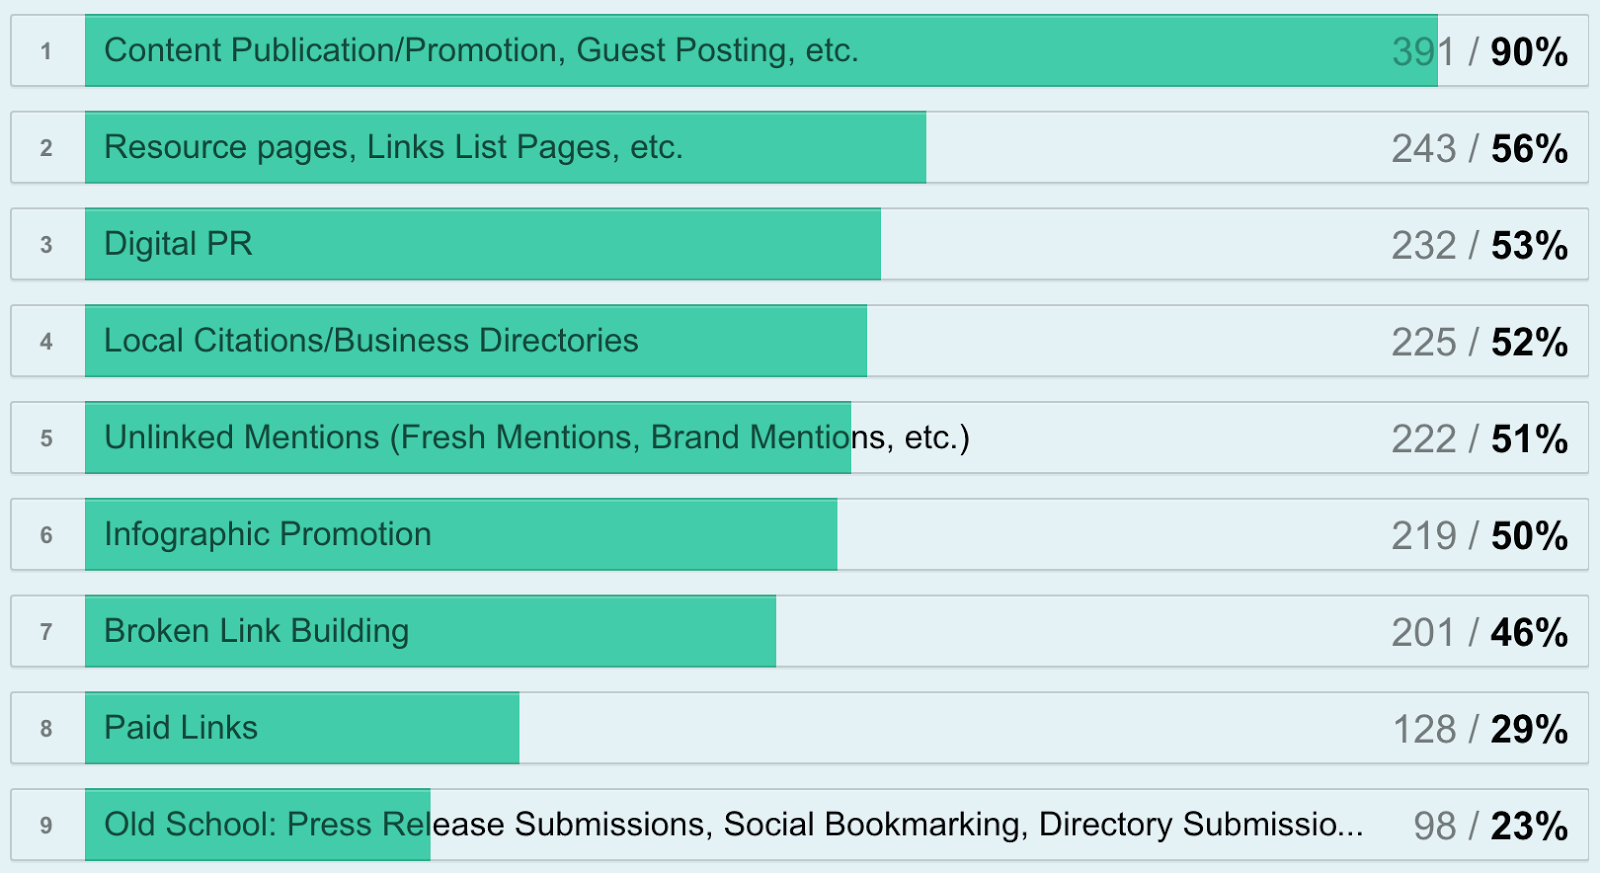 survey q10 link building tactics used.png